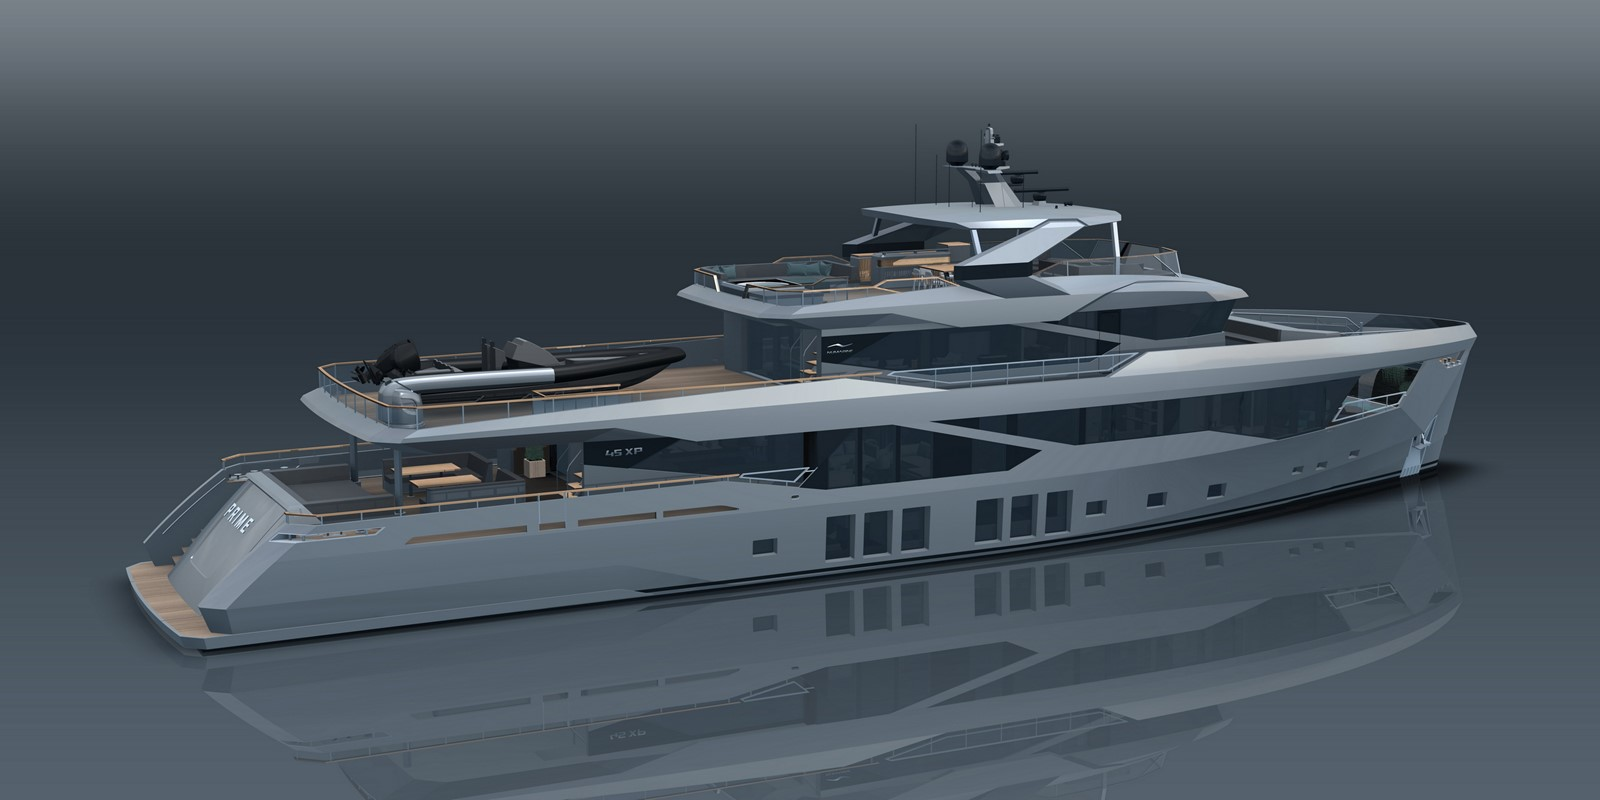 2021 NUMARINE 45XP Expedition Yacht 2549307